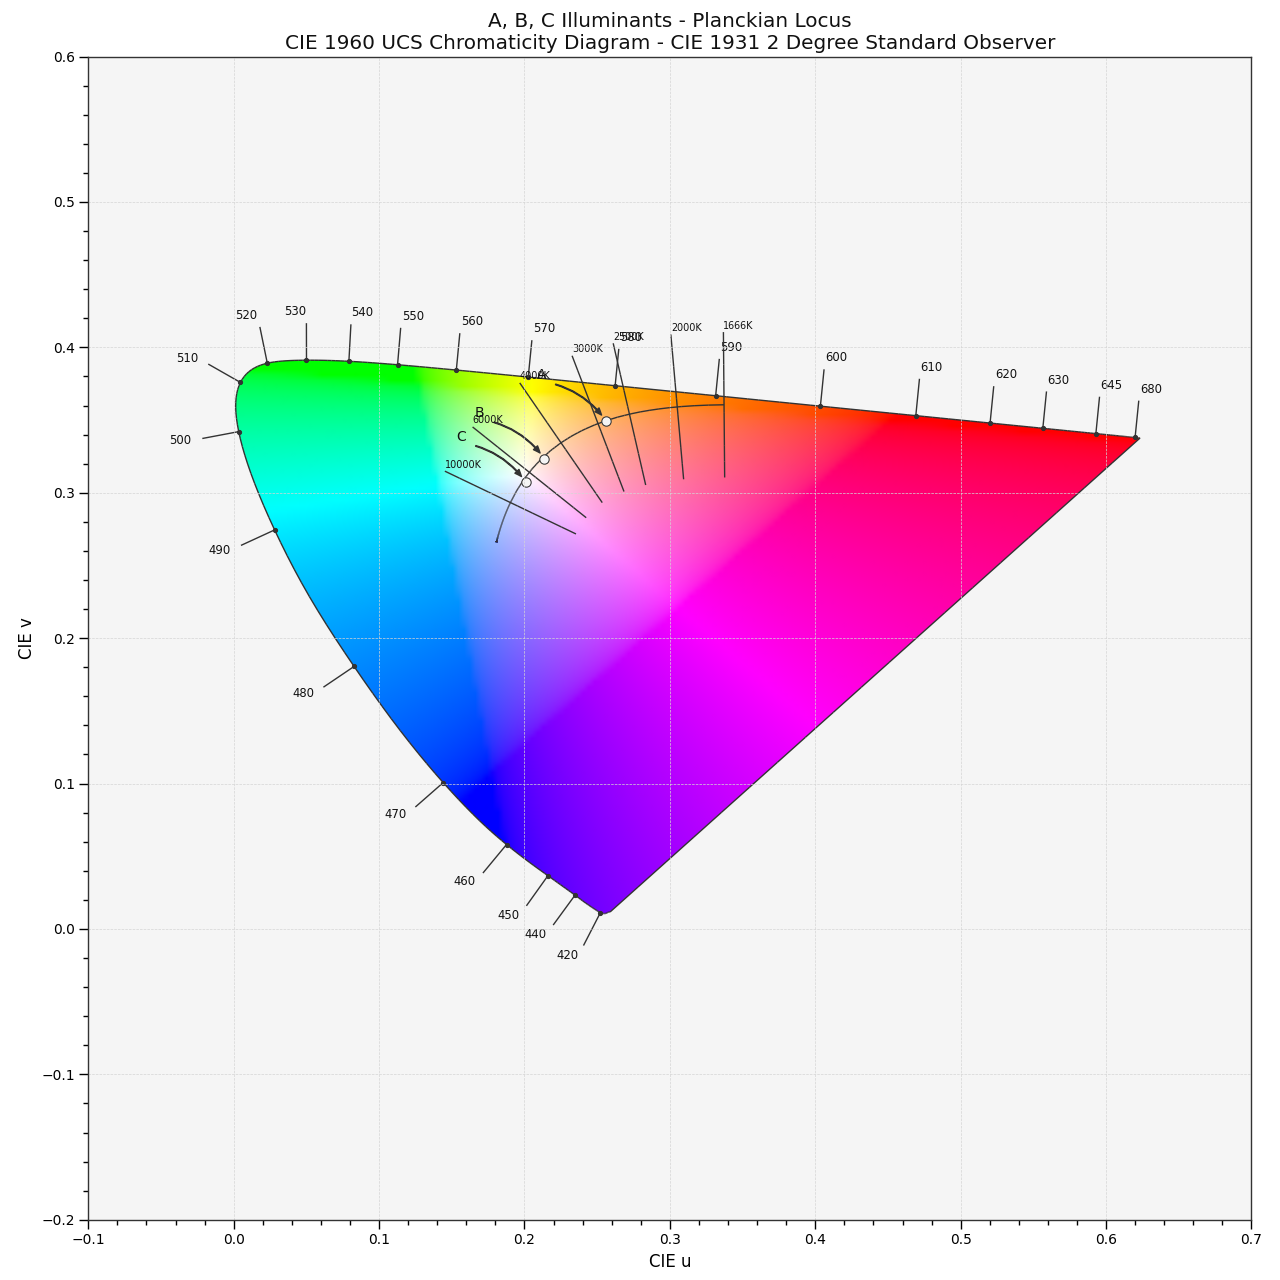 https://colour.readthedocs.io/en/develop/_static/Examples_Plotting_CCT_CIE_1960_UCS_Chromaticity_Diagram.png